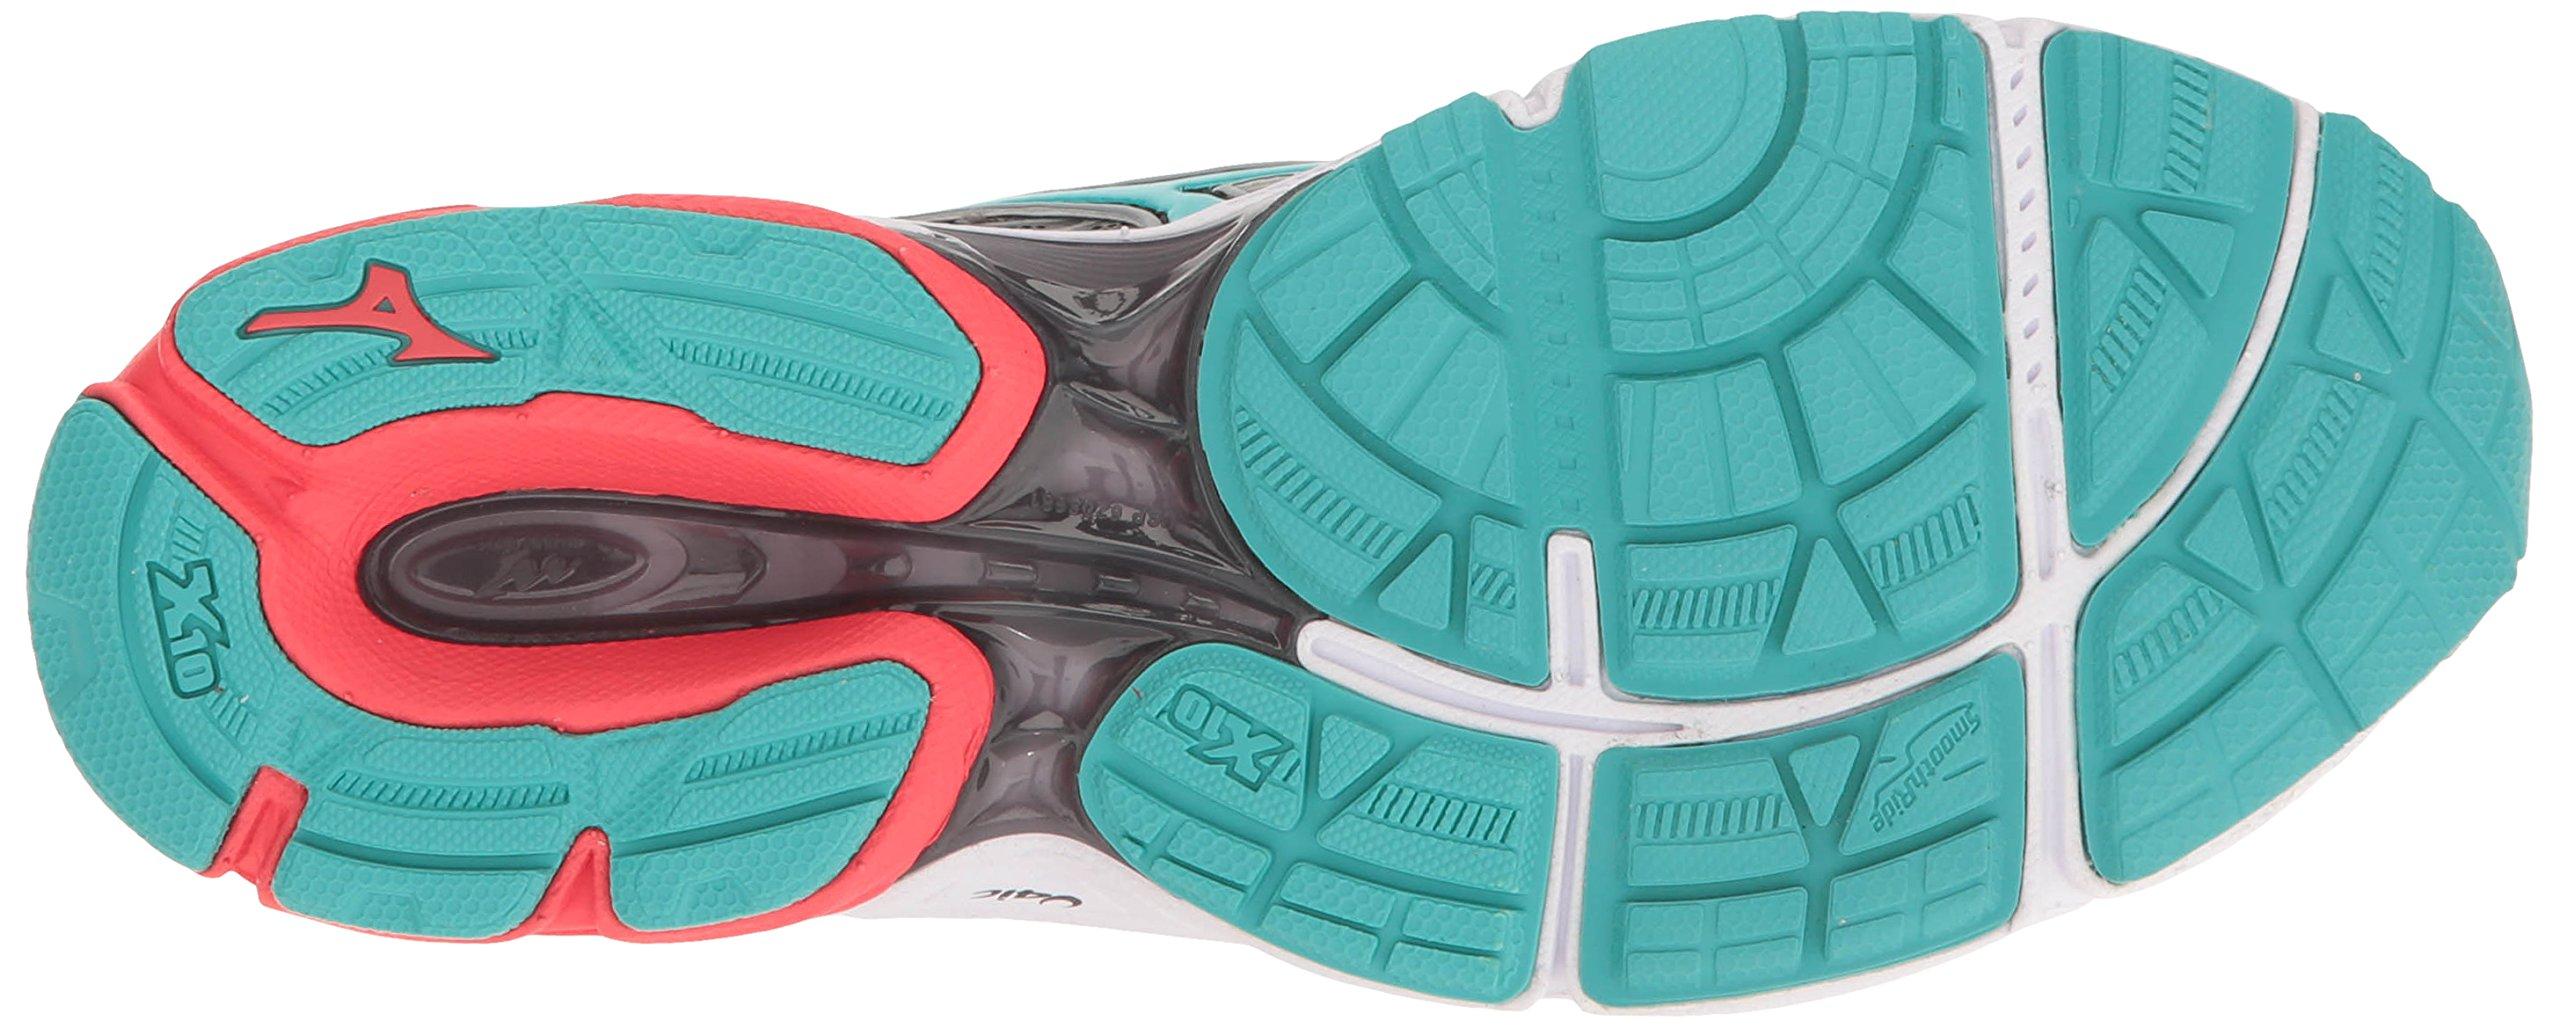 Mizuno Women's Wave Catalyst 2 Running Shoe, Grey/Mint, 9 B US by Mizuno (Image #3)